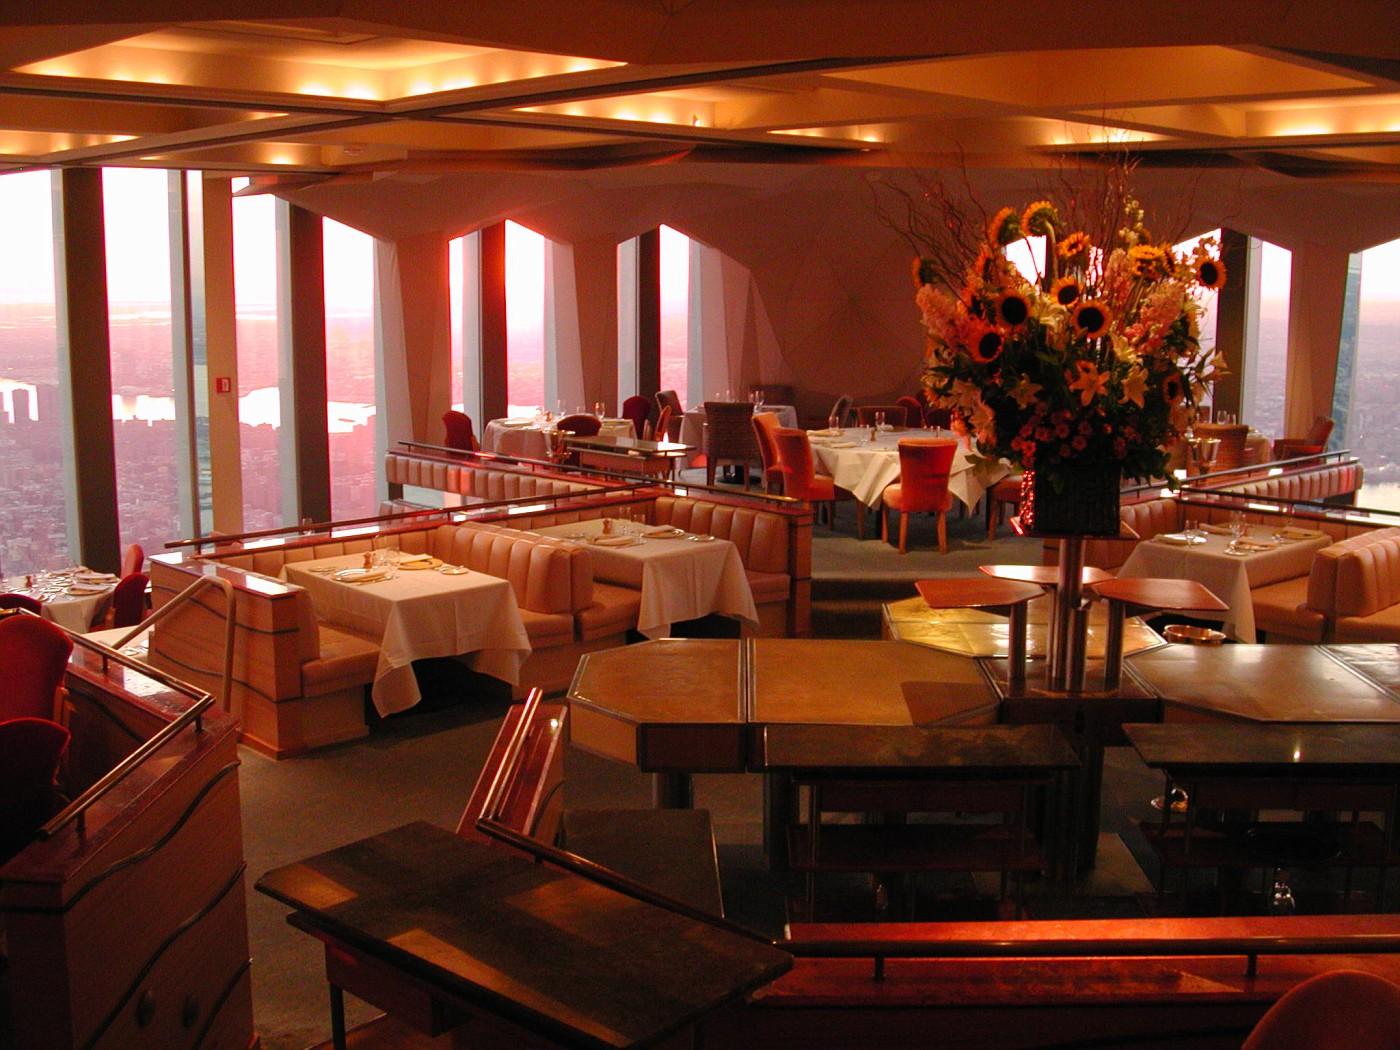 Ресторан Windows on the World, на 106-м и 107-м этажах Северной башни WTC, 2000